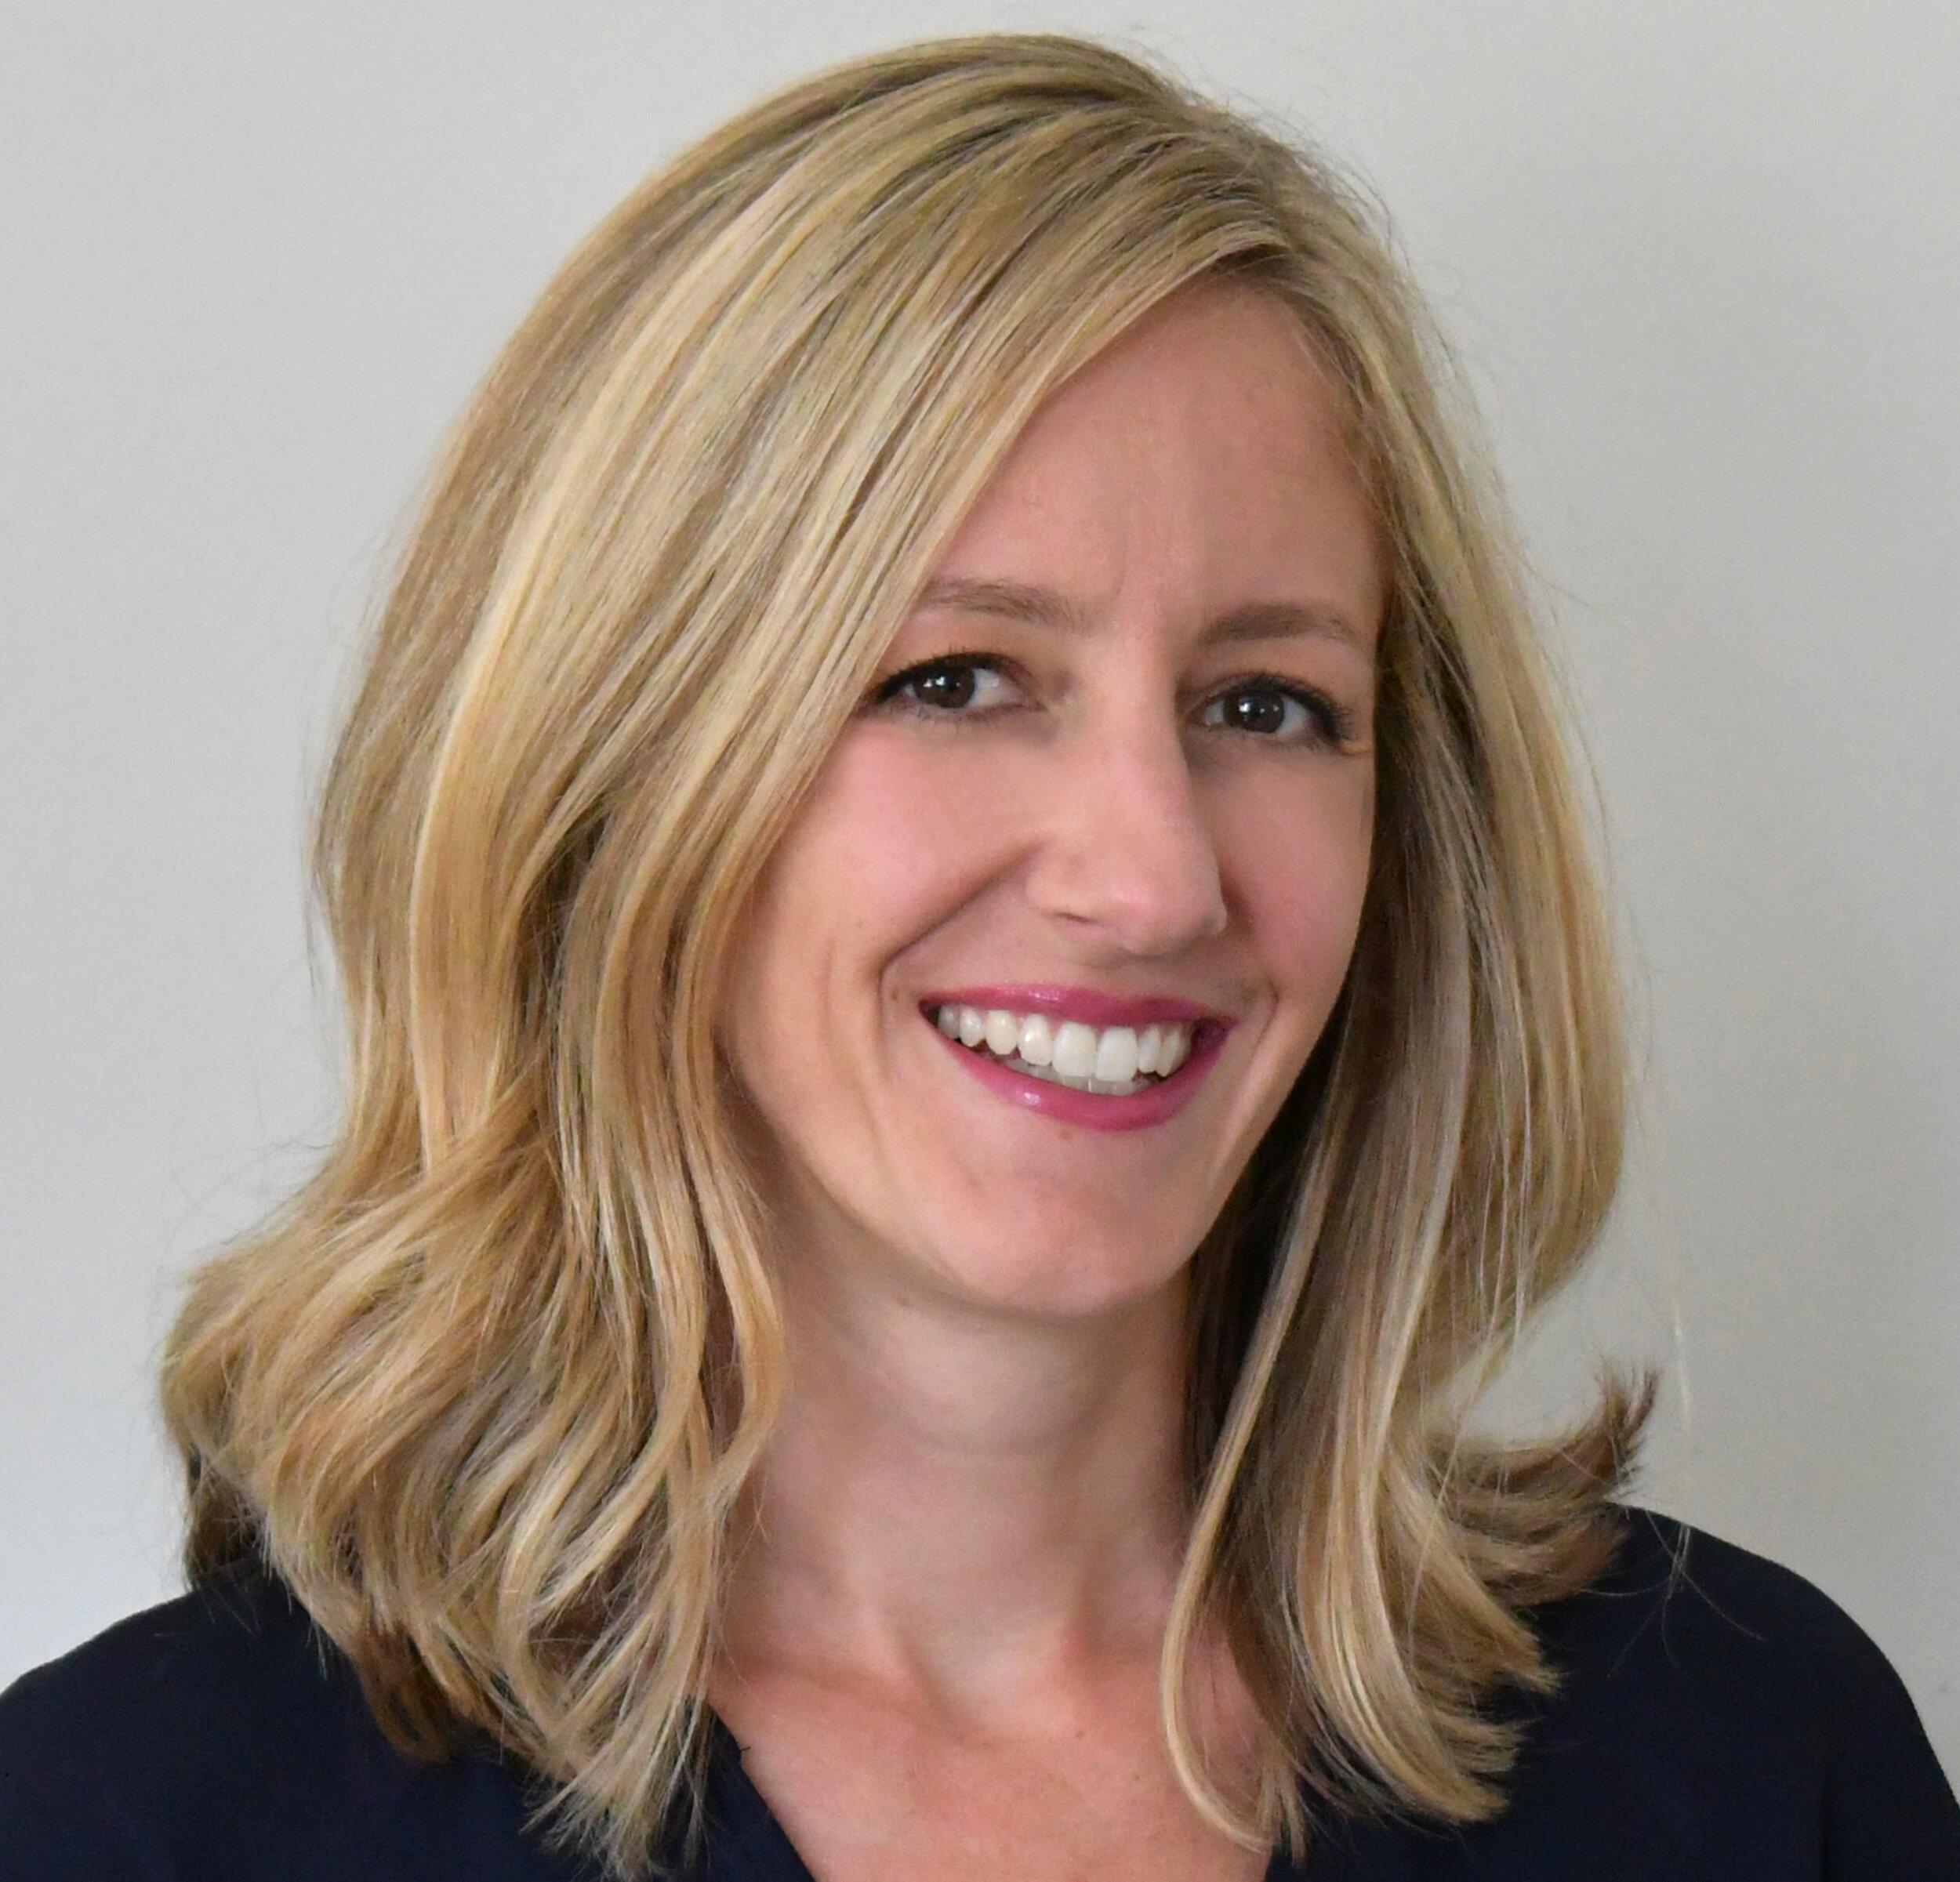 Heather Hersh, LEED AP BD+C   Founding Principal  heather.hersh@xvadesign.com